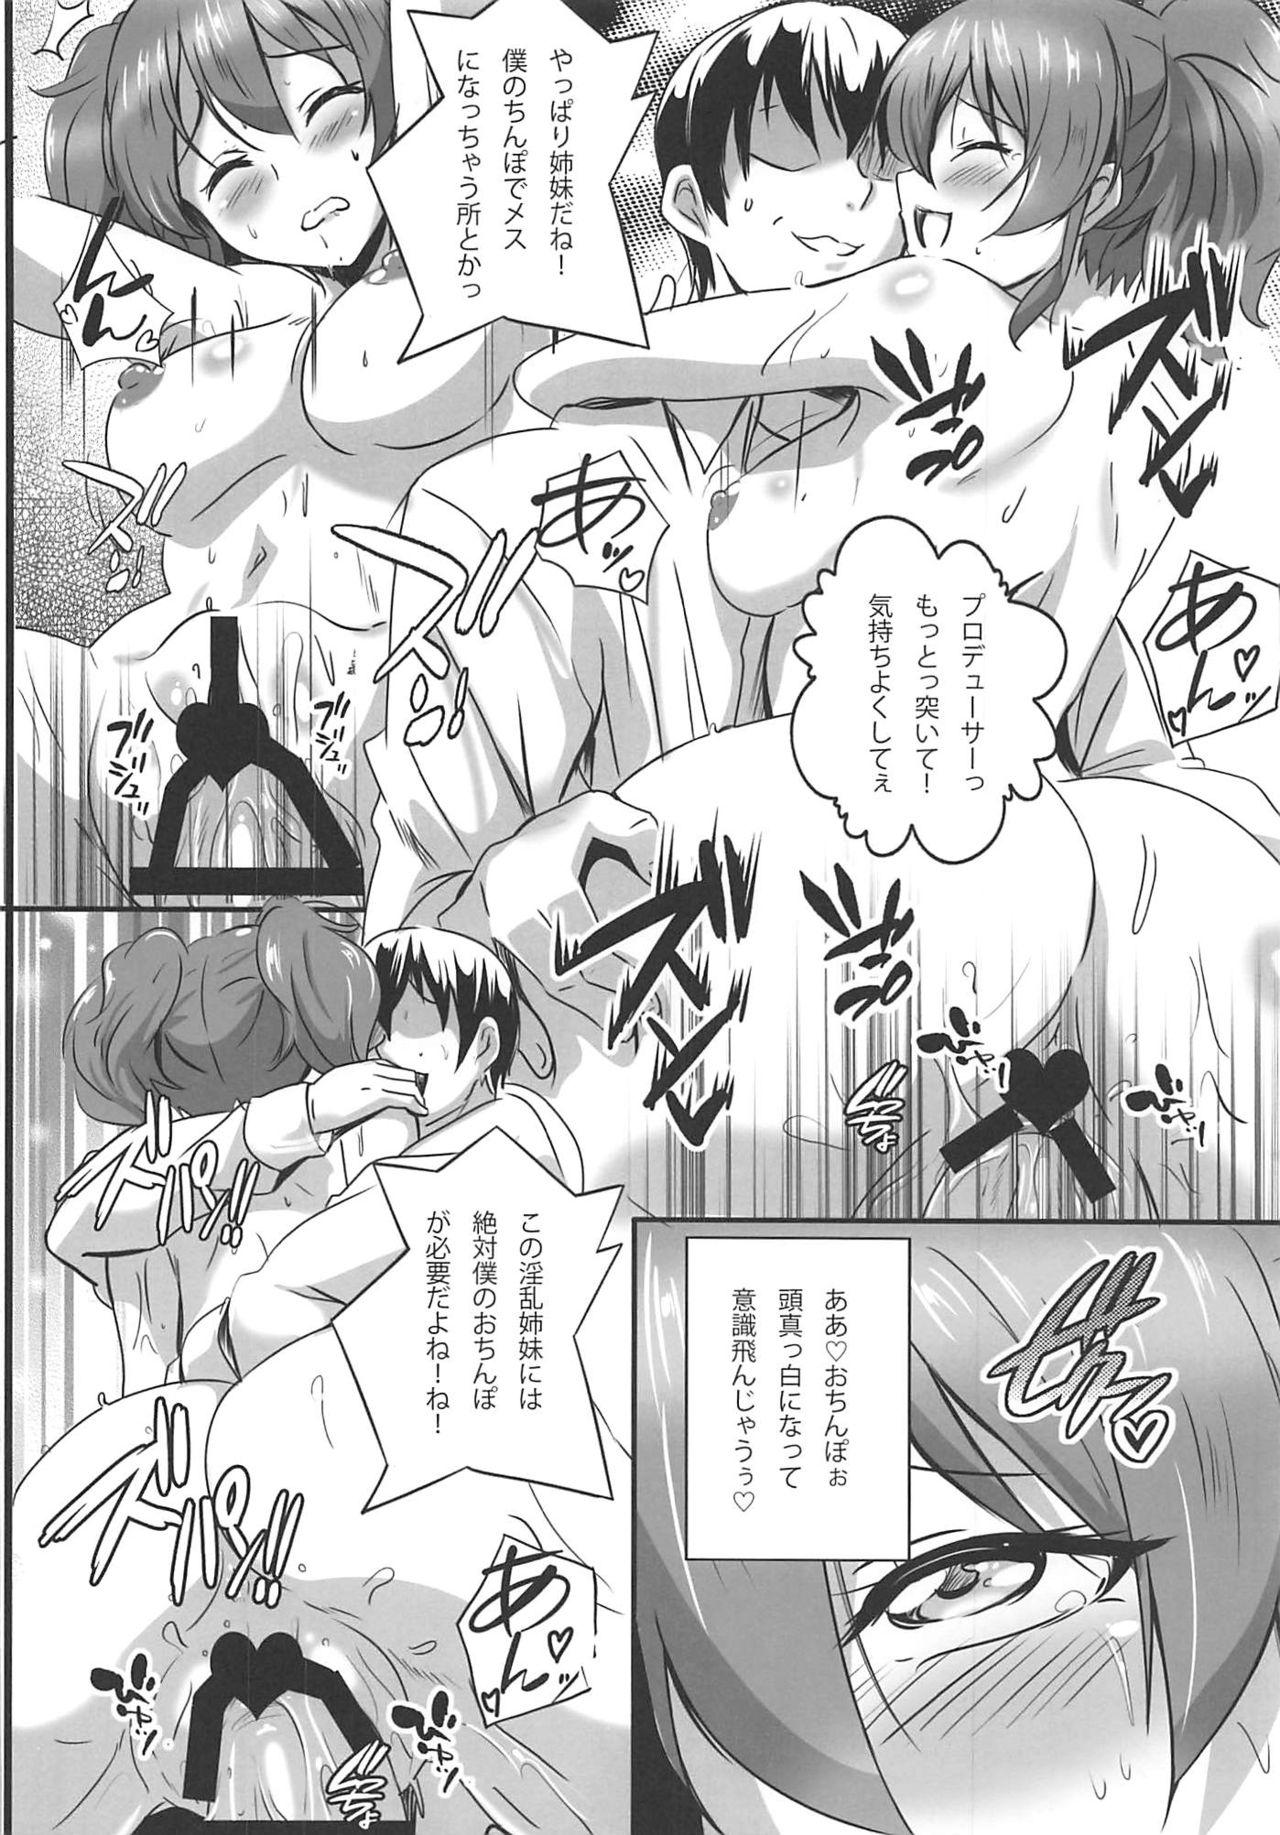 P-kun! Yarisugi! 3 13